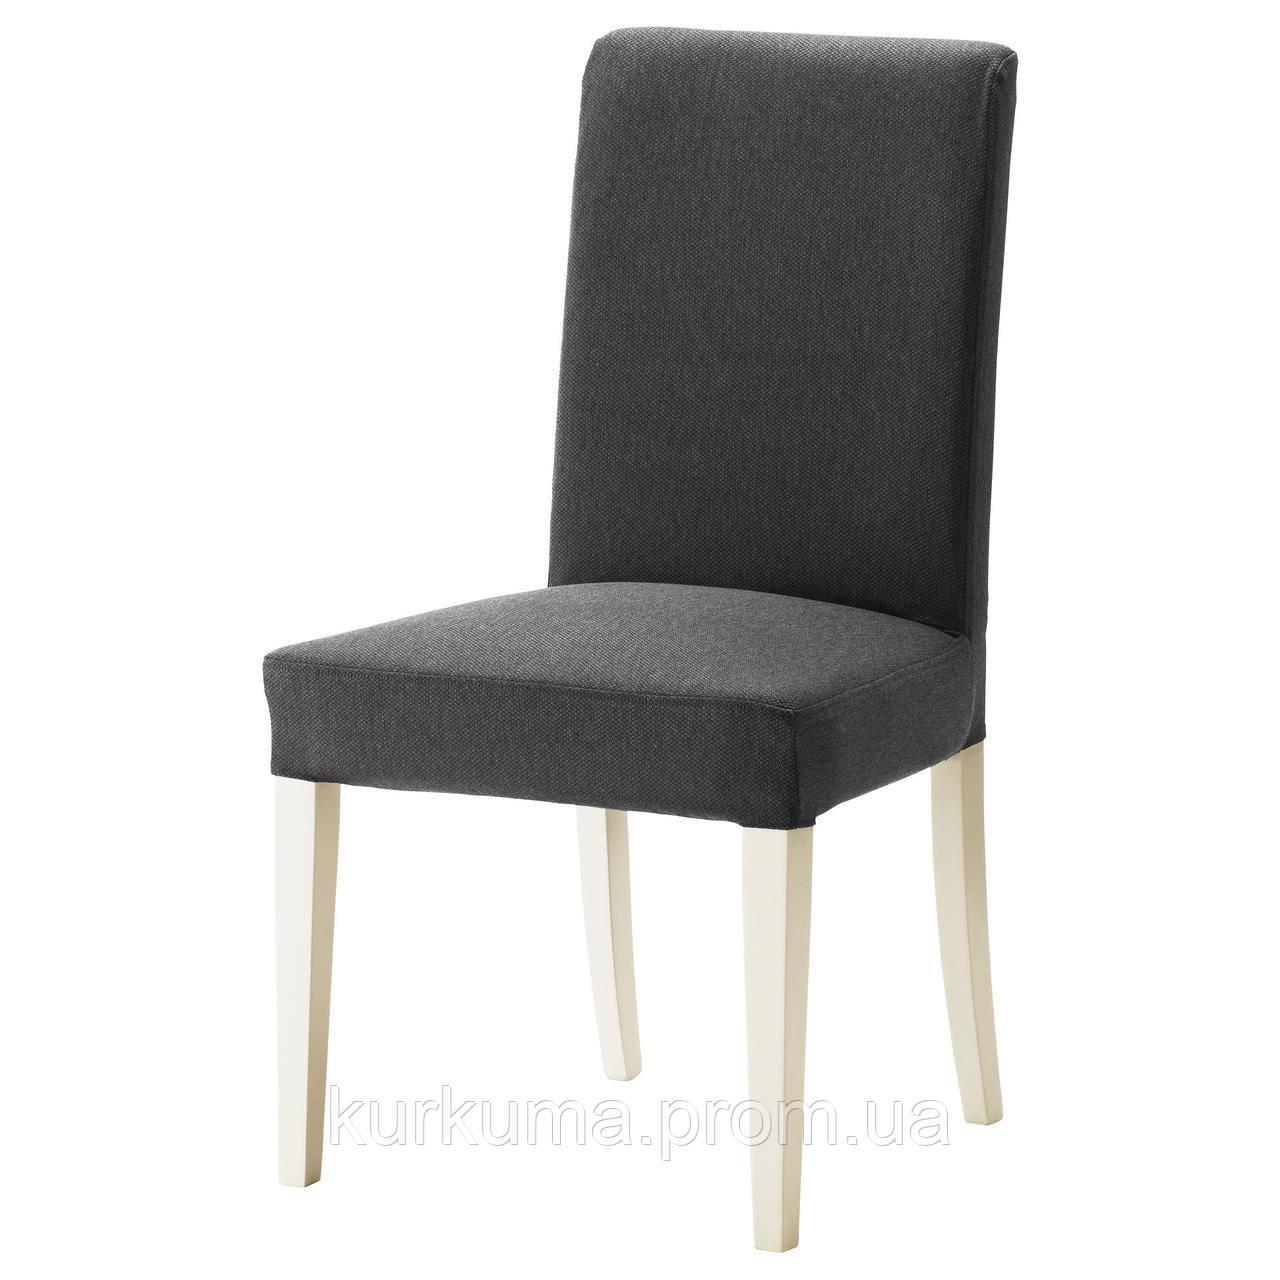 IKEA HENRIKSDAL Стул, белый, ДАНСБУ темно-серый  (399.264.53)